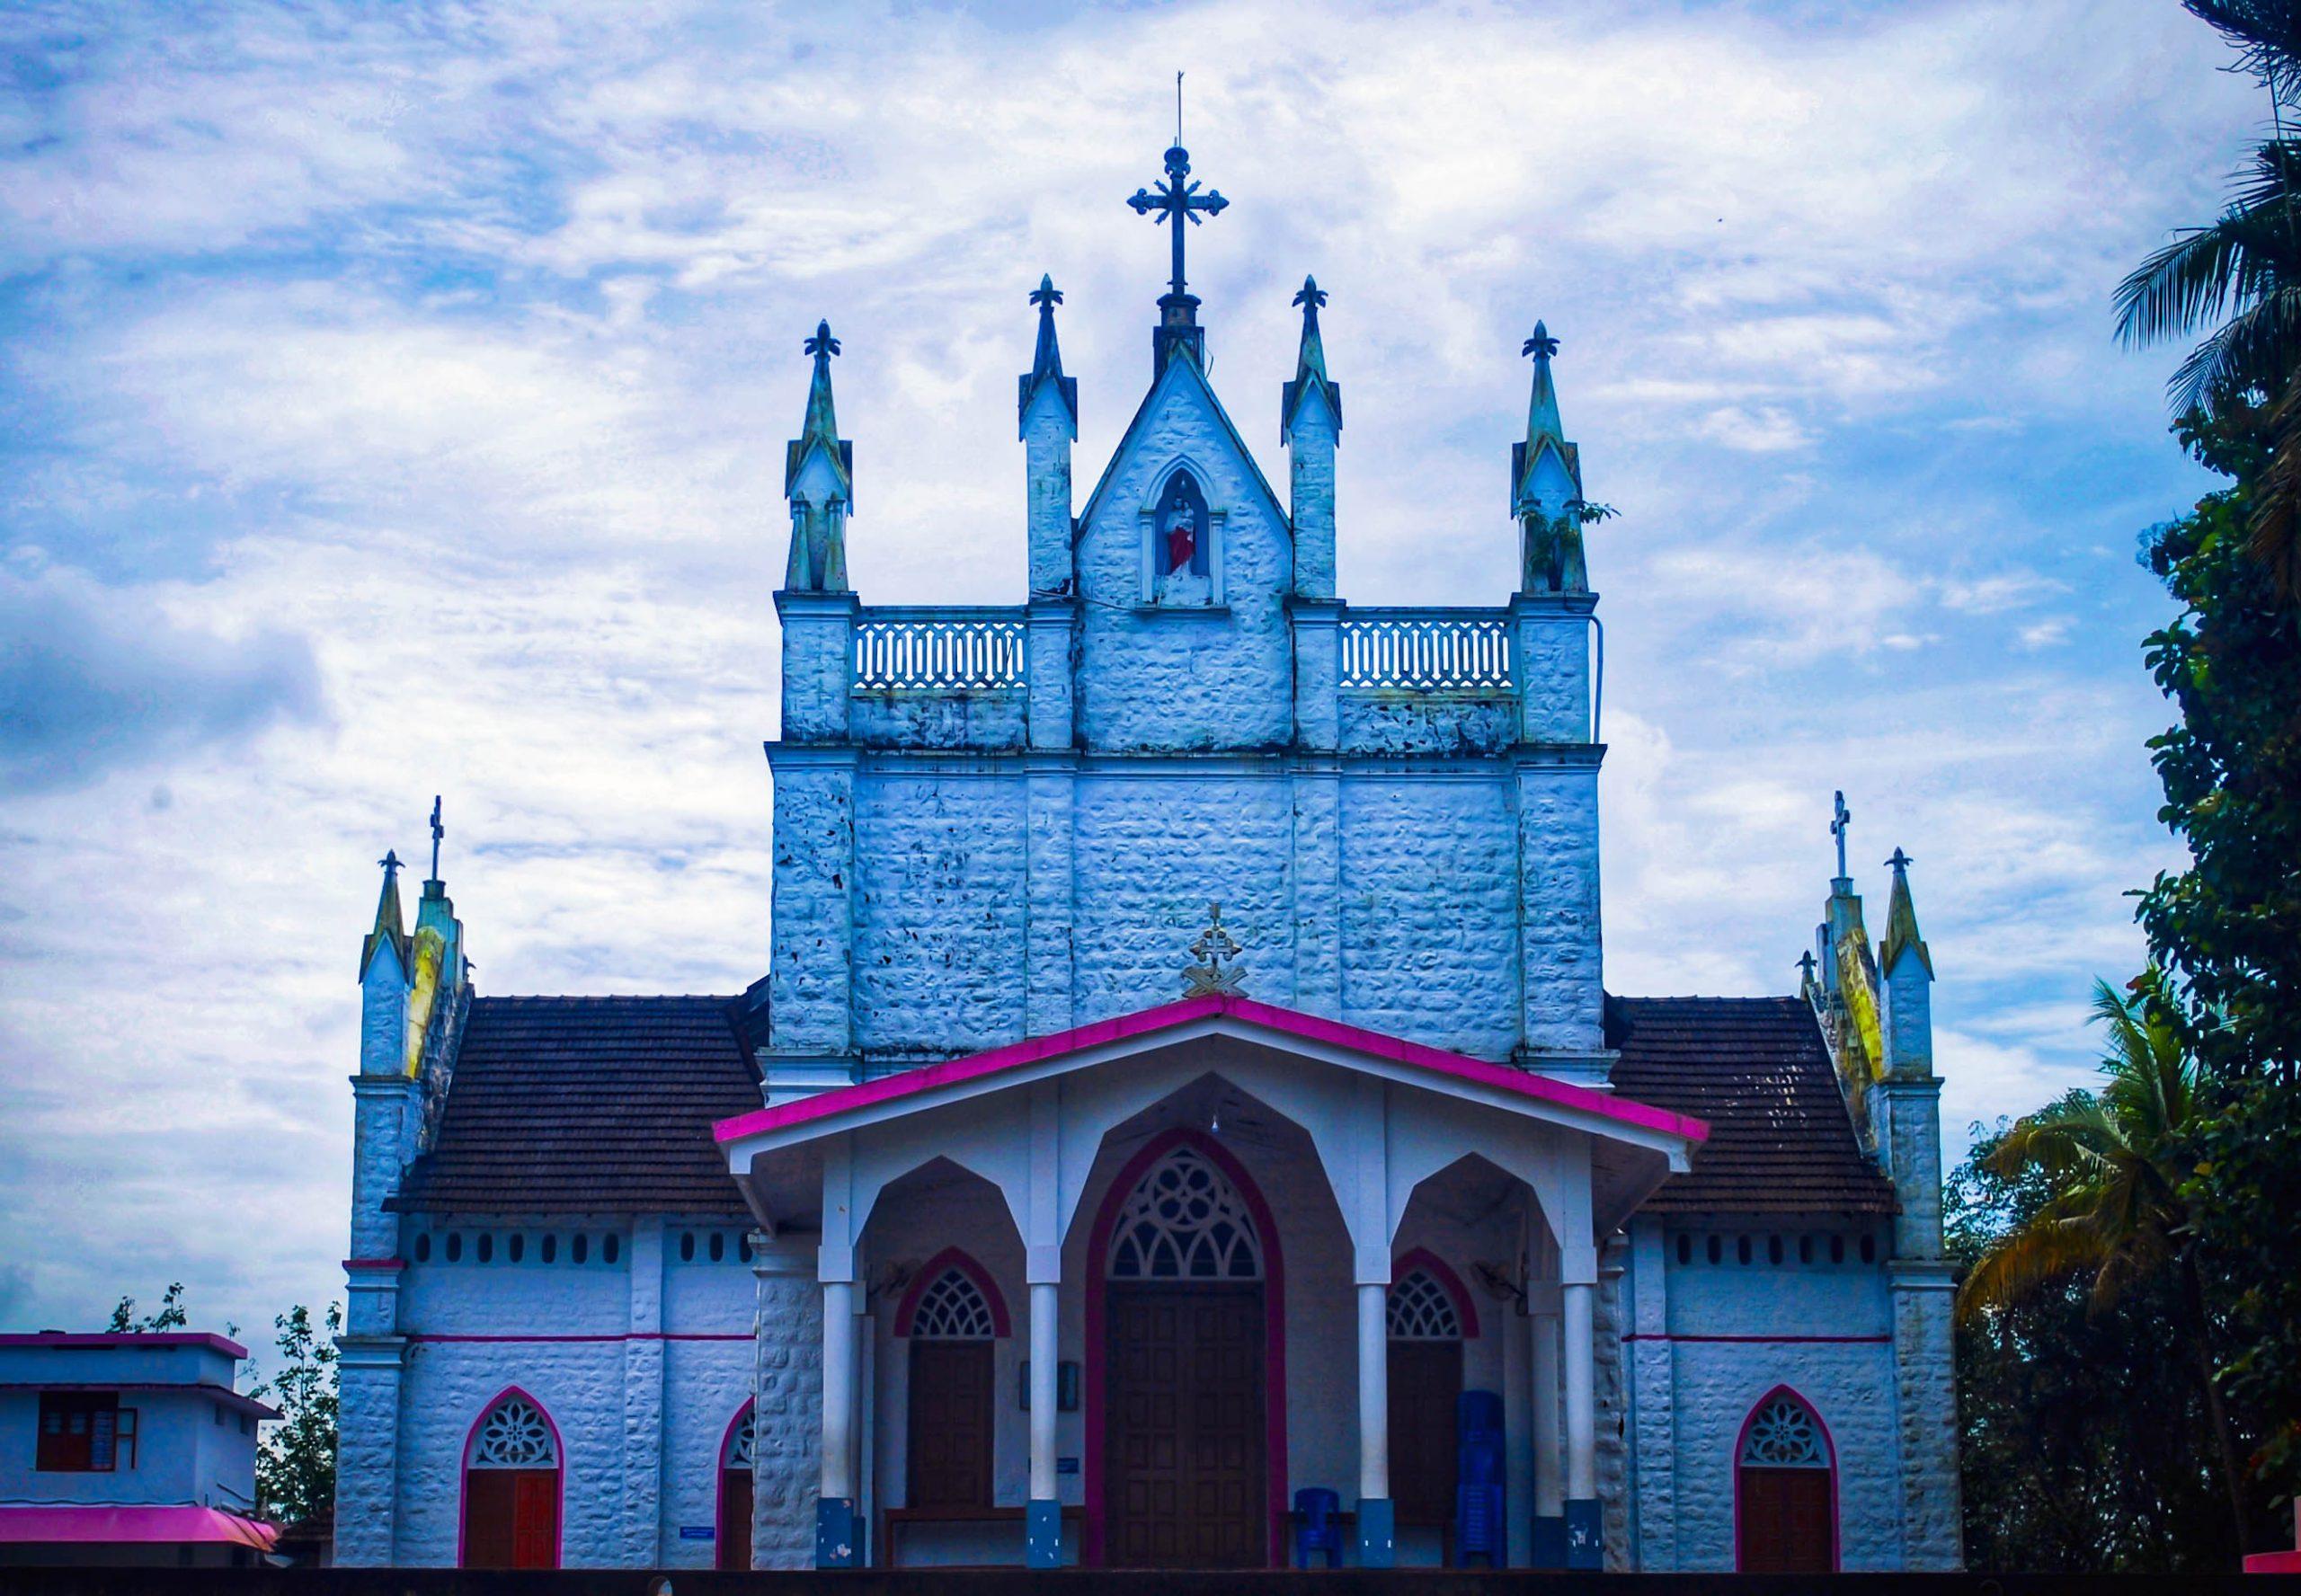 Entrance of a church